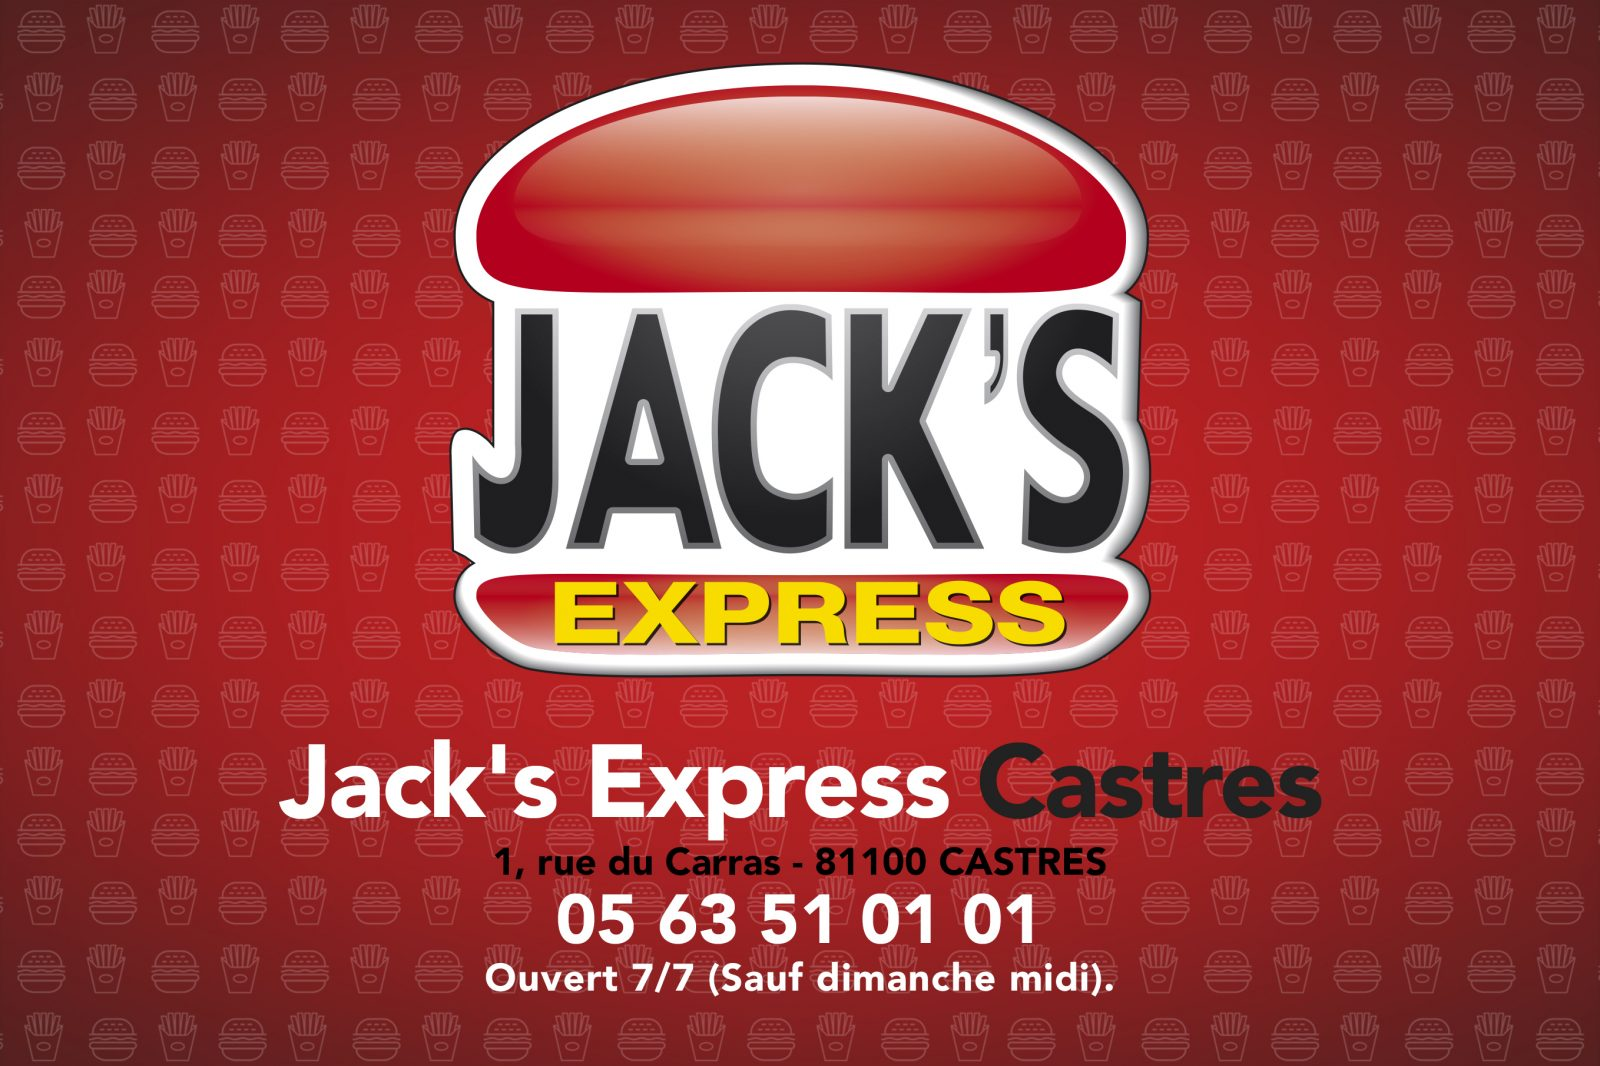 Jack's Express 1